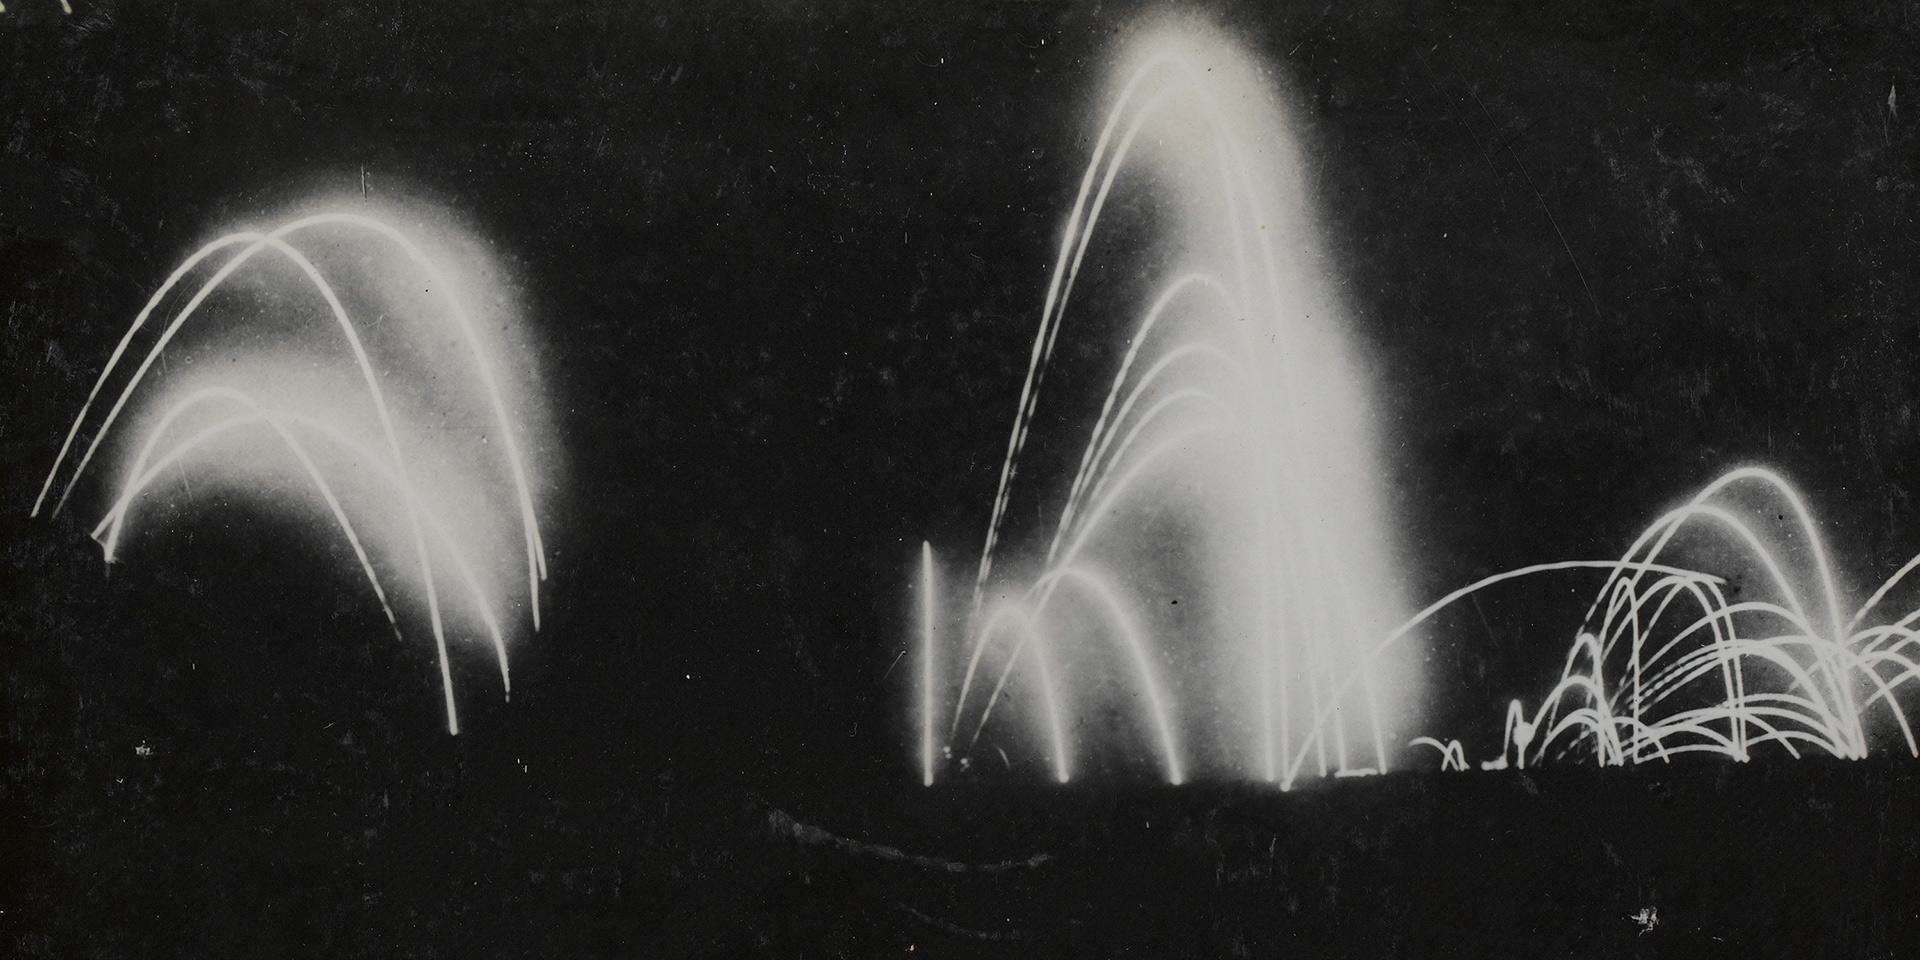 Bombardment at Beaumont Hamel, 2 July 1916